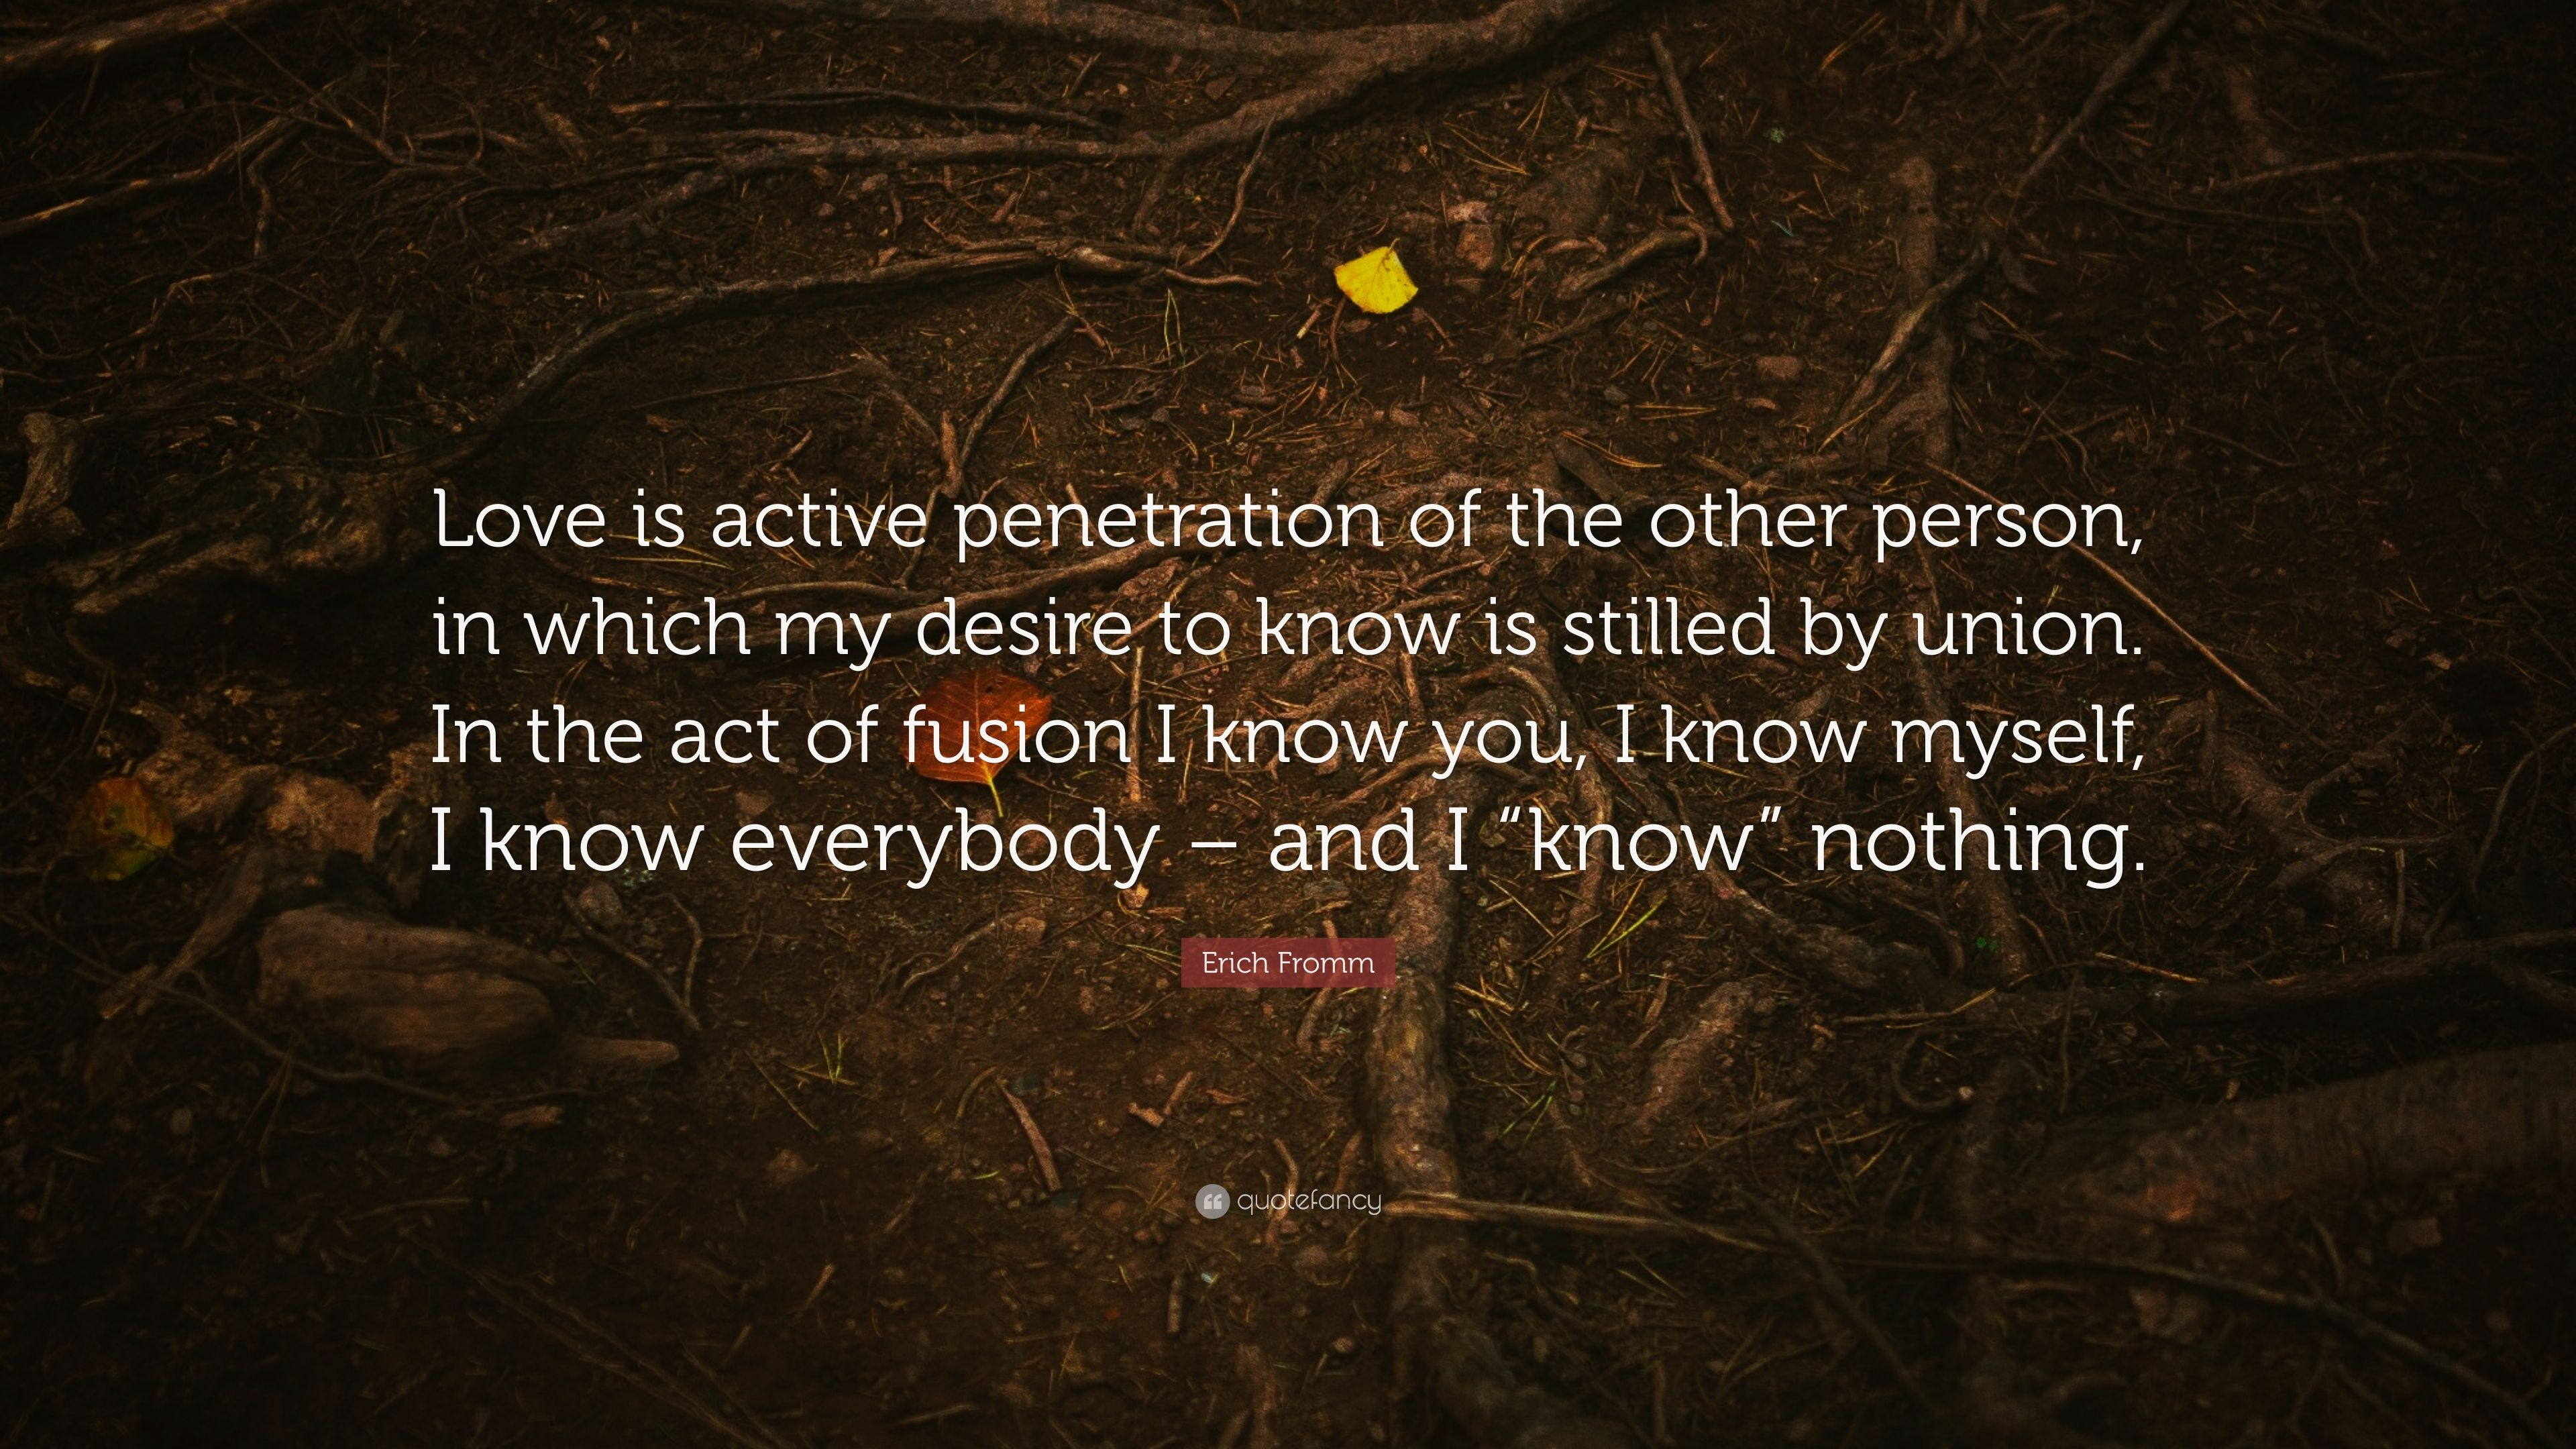 Desire for penetration